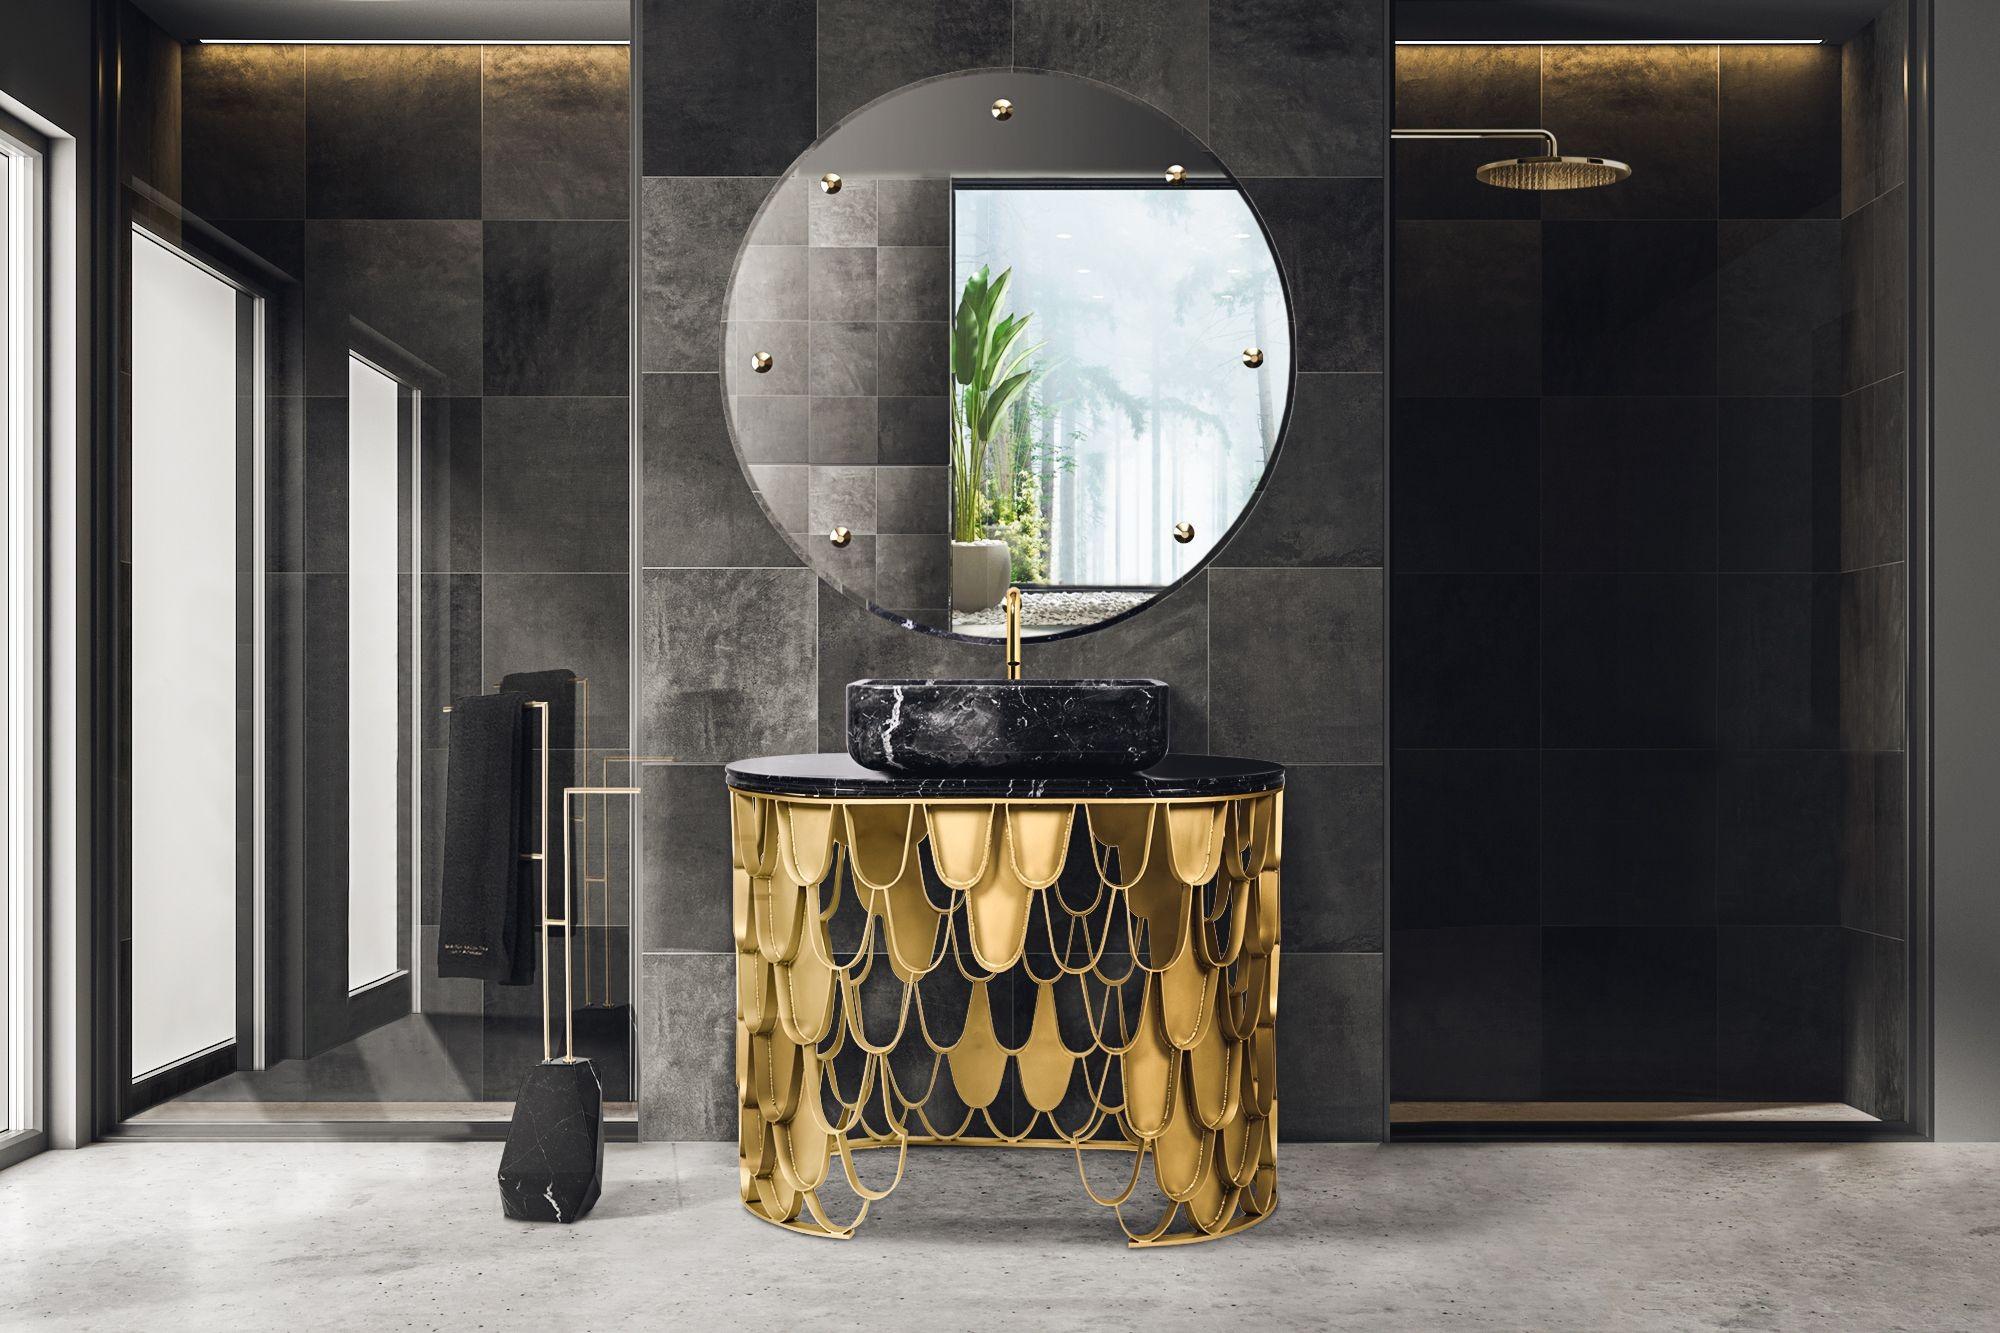 Bathroom Inspirations To Get The Perfect Home Oasis Bathroom Inspirations Bathroom Inspirations To Get The Perfect Home Oasis black luminous and polished modern bathroom with koi single washbasin